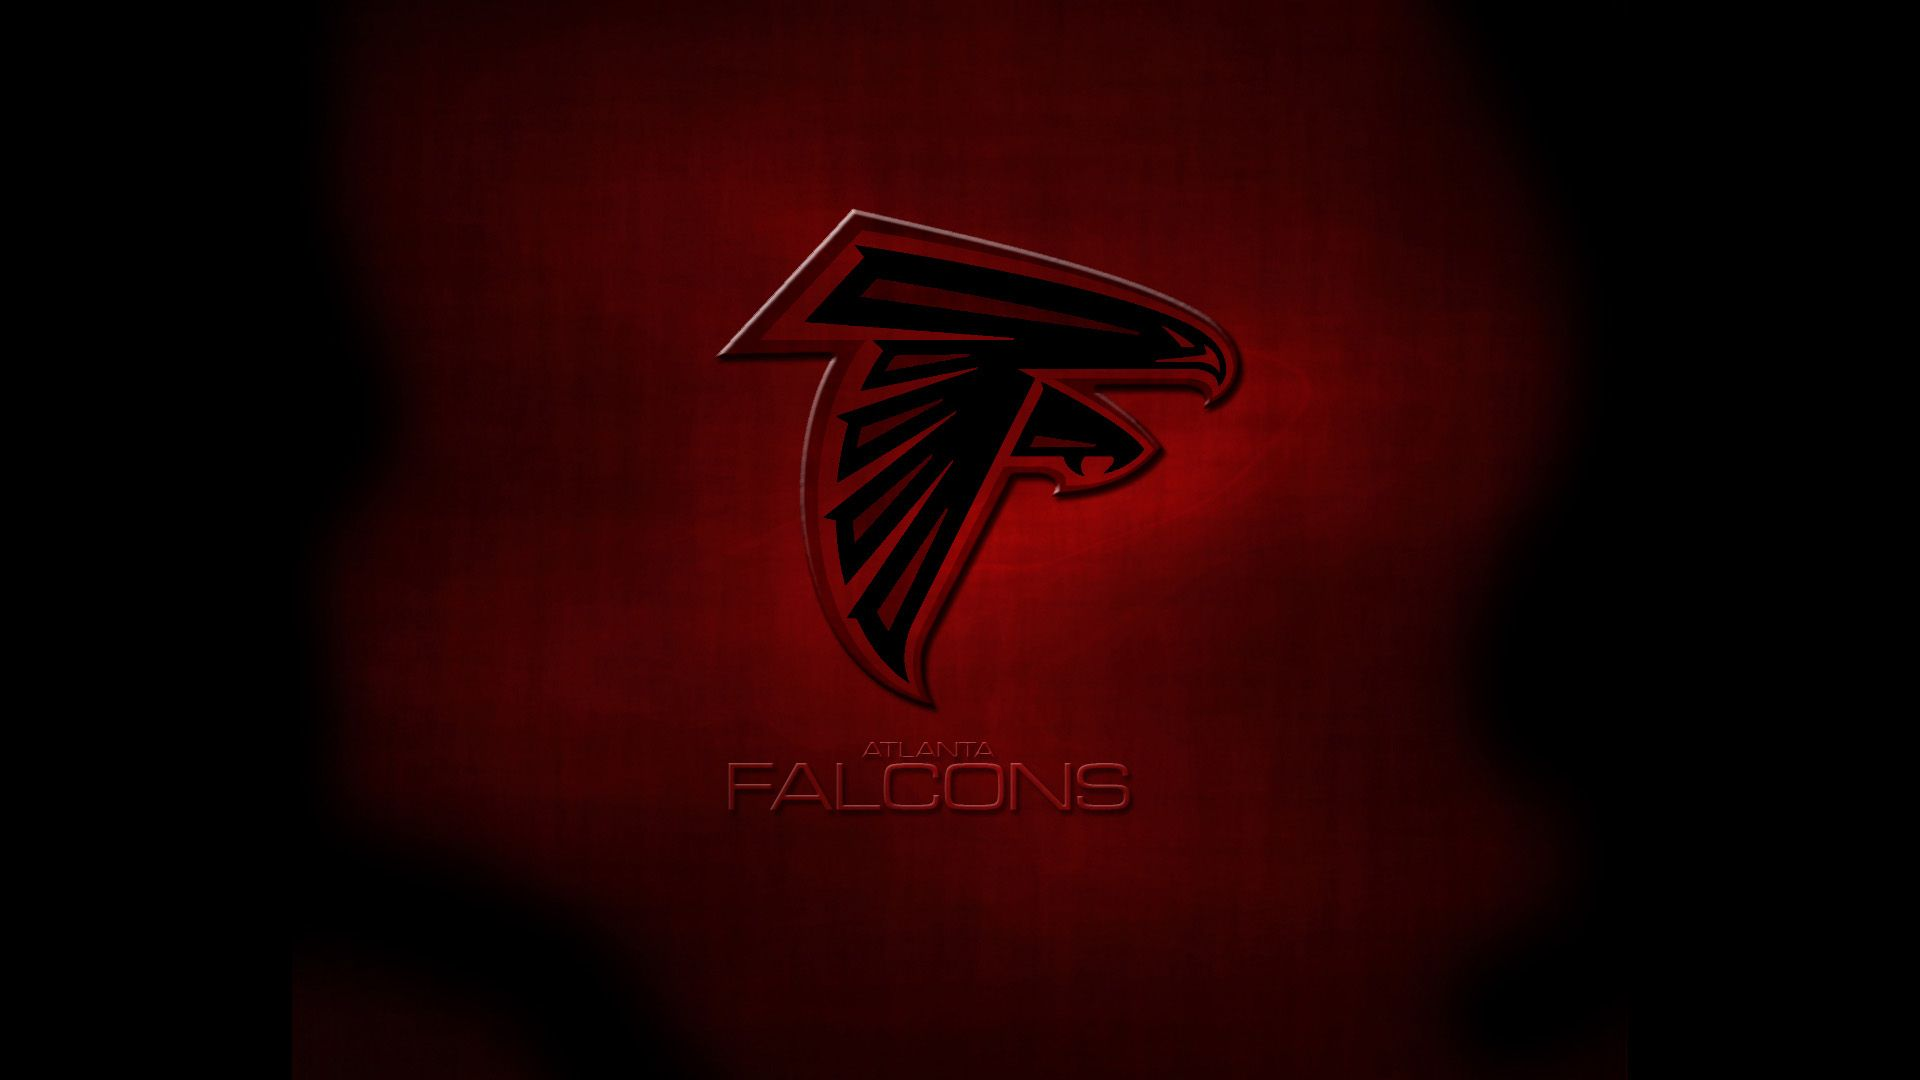 Atlanta Falcons Atlanta Falcons Wallpaper Atlanta Falcons Falcons